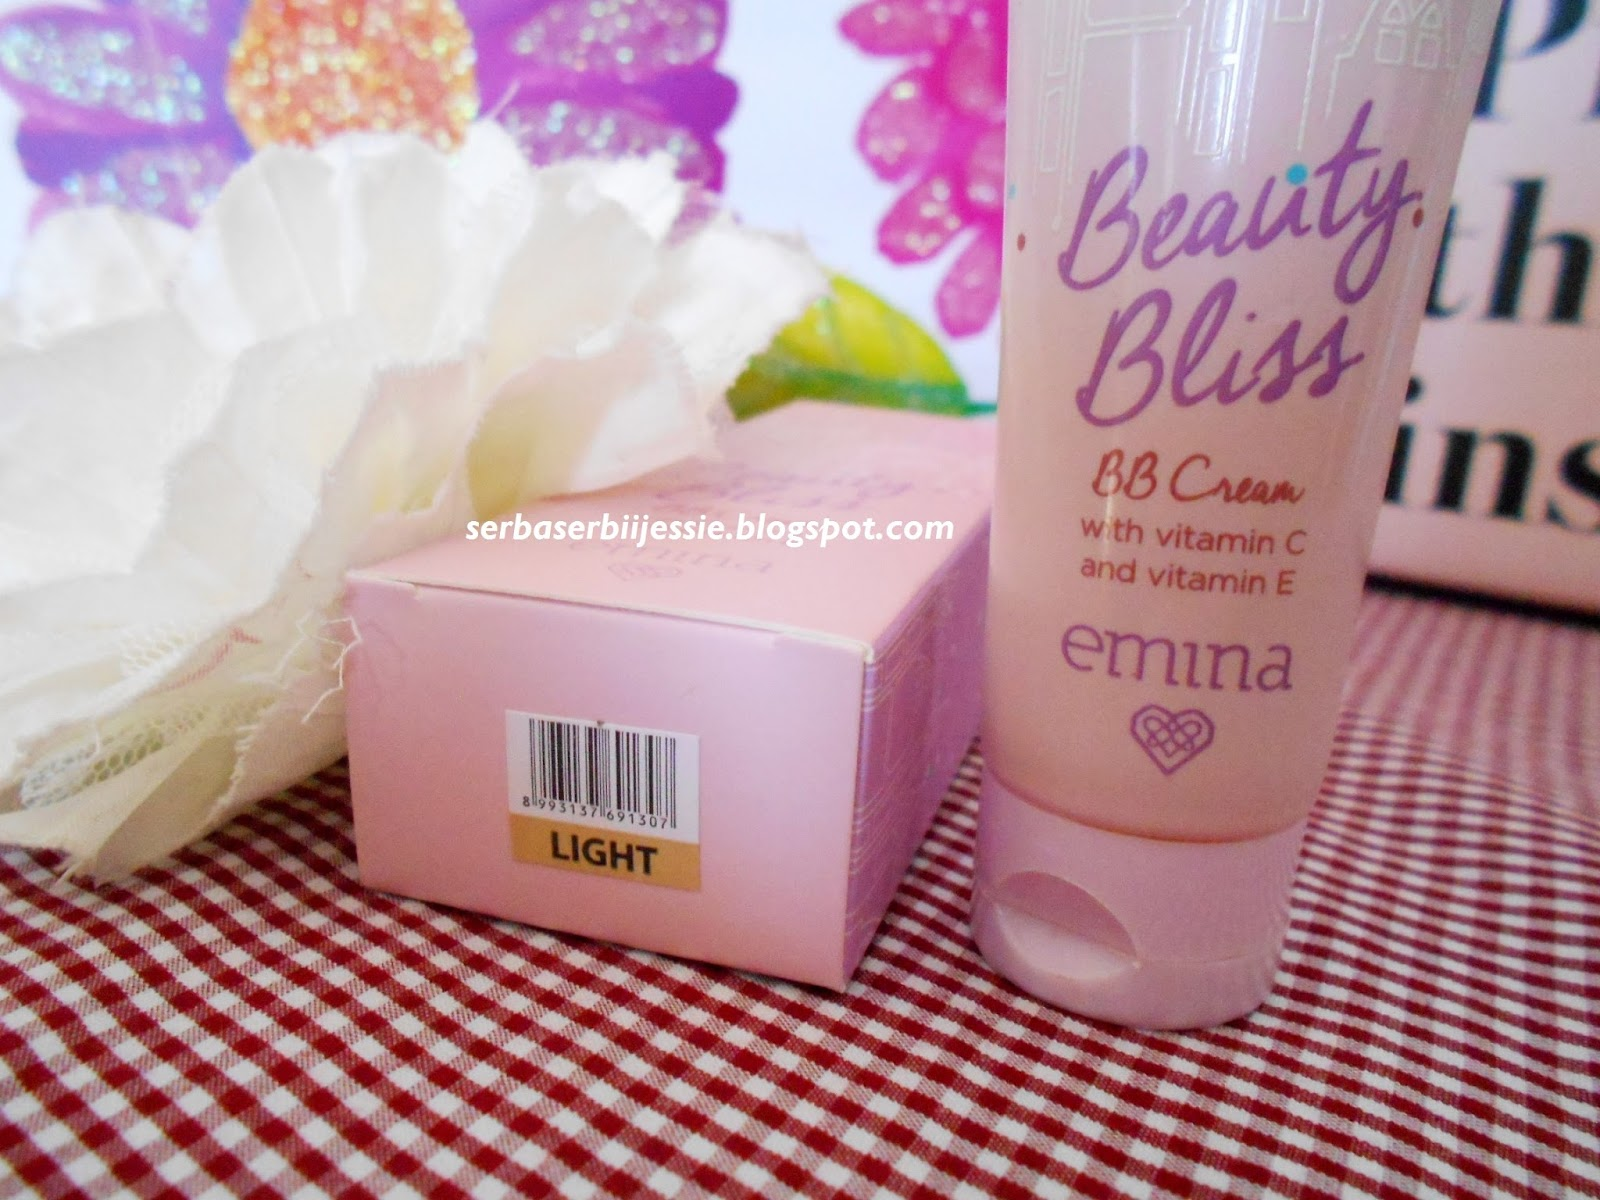 Emina Beauty Bliss Bb Cream Light Daftar Harga Terbaru Dan Natural Cosmetics Review